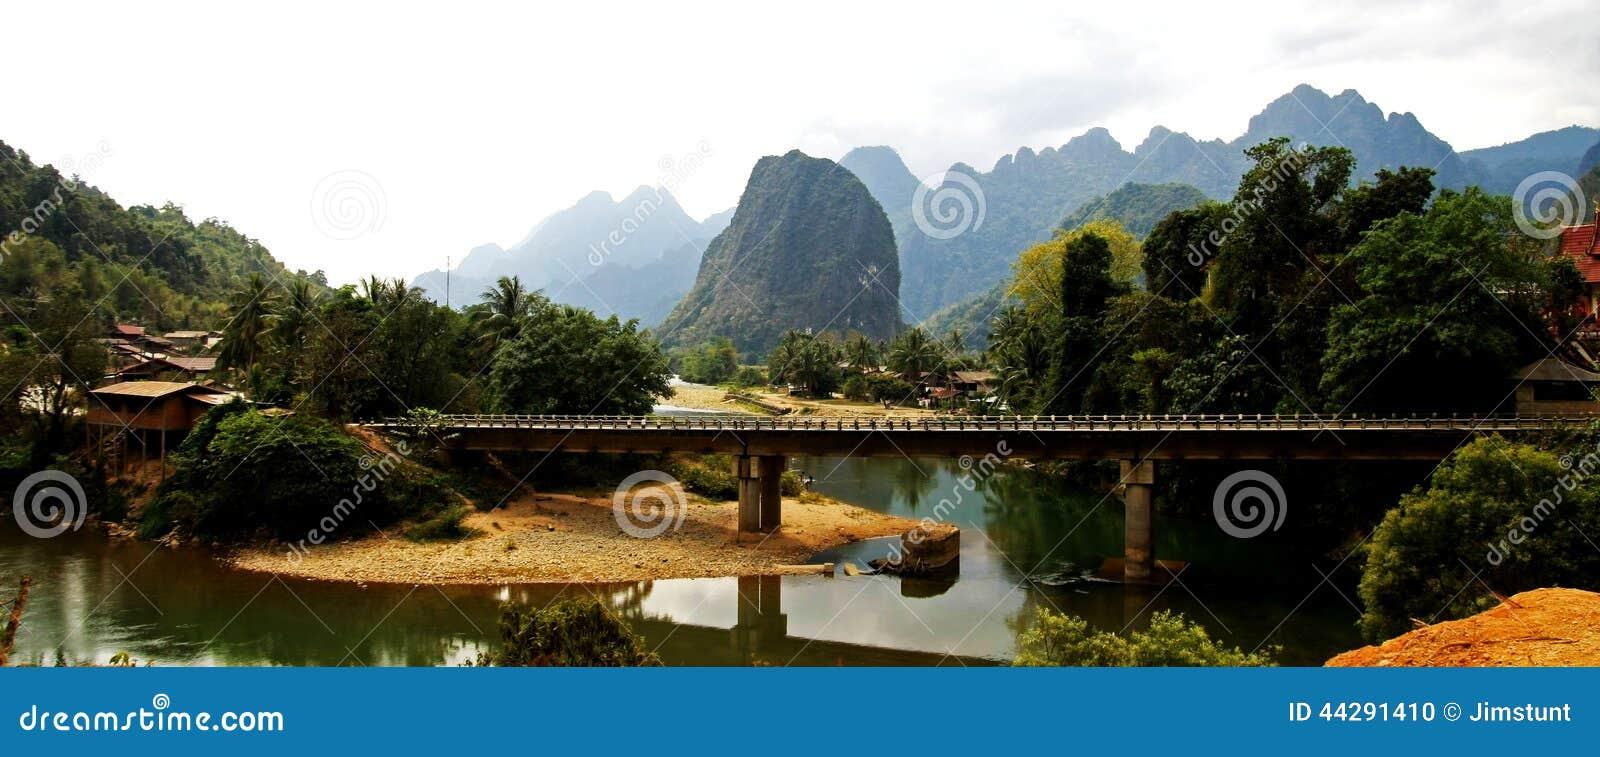 Ban That Laos  city photos gallery : Ban Pha Tang Bridge Stock Photo Image: 44291410